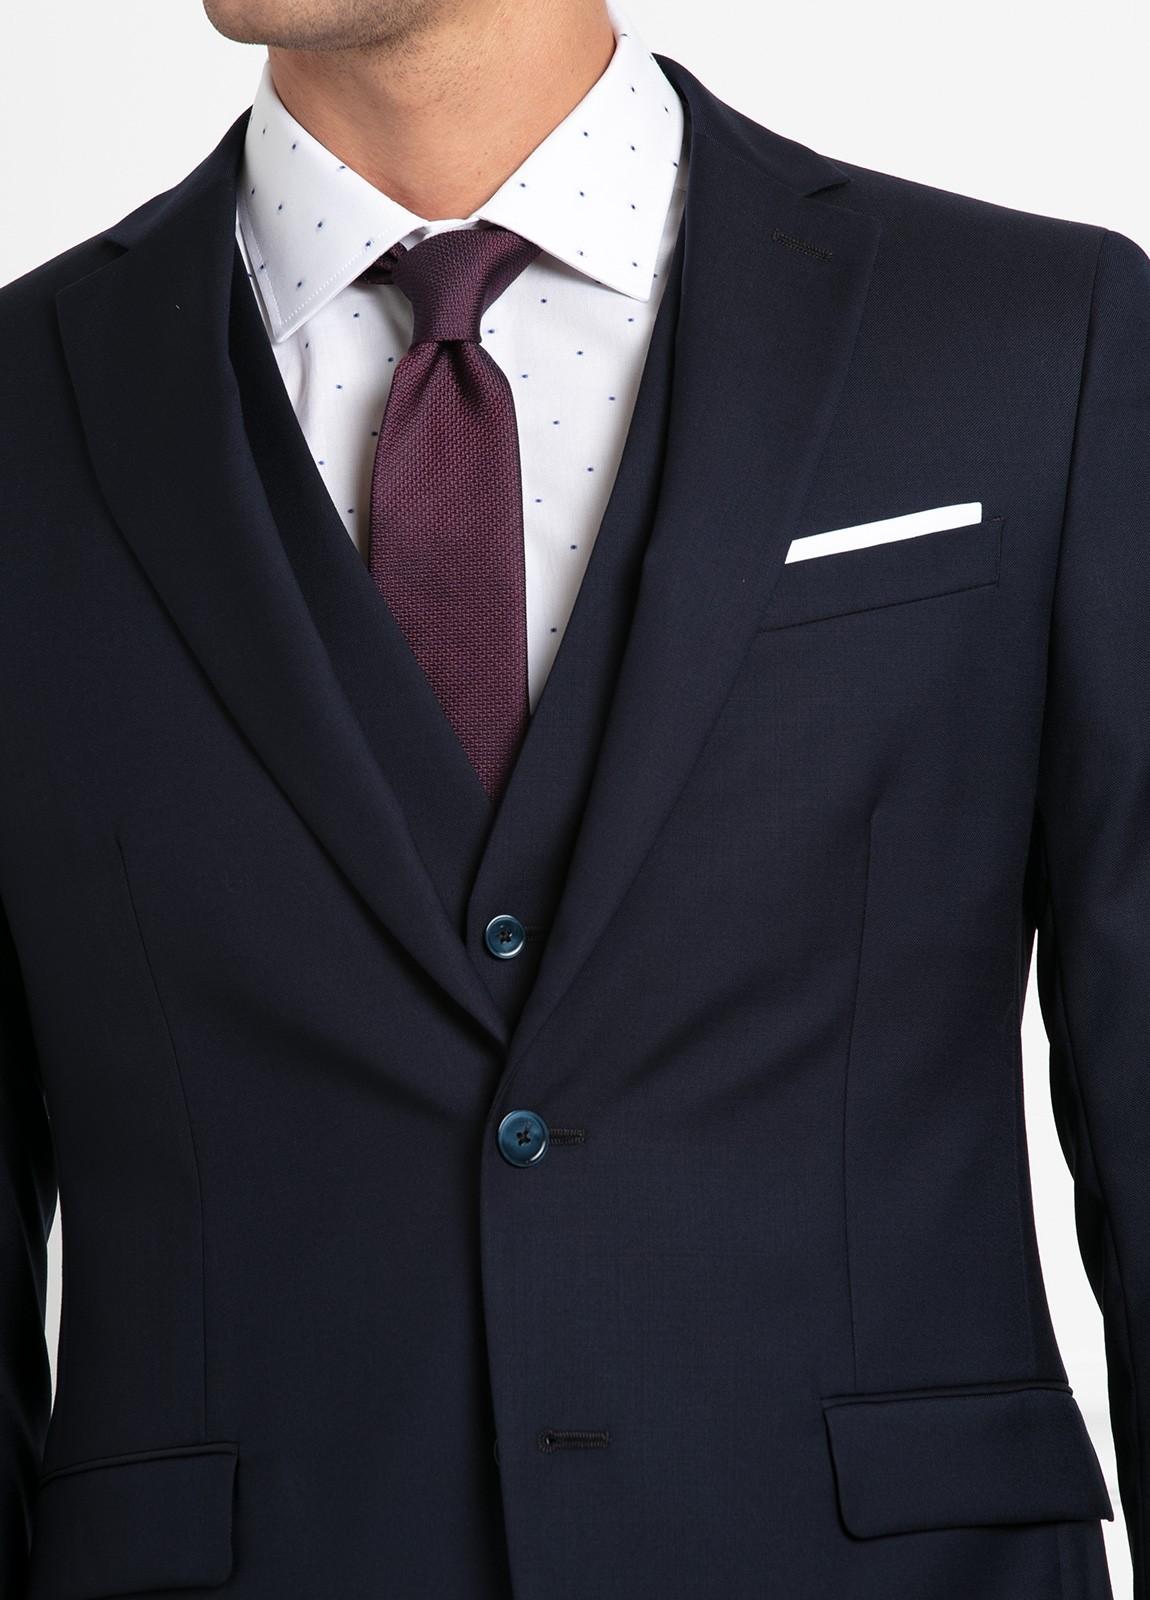 Traje liso SLIM FIT, tejido VBC con chaleco incluido, color azul marino, 100% Lana. - Ítem2